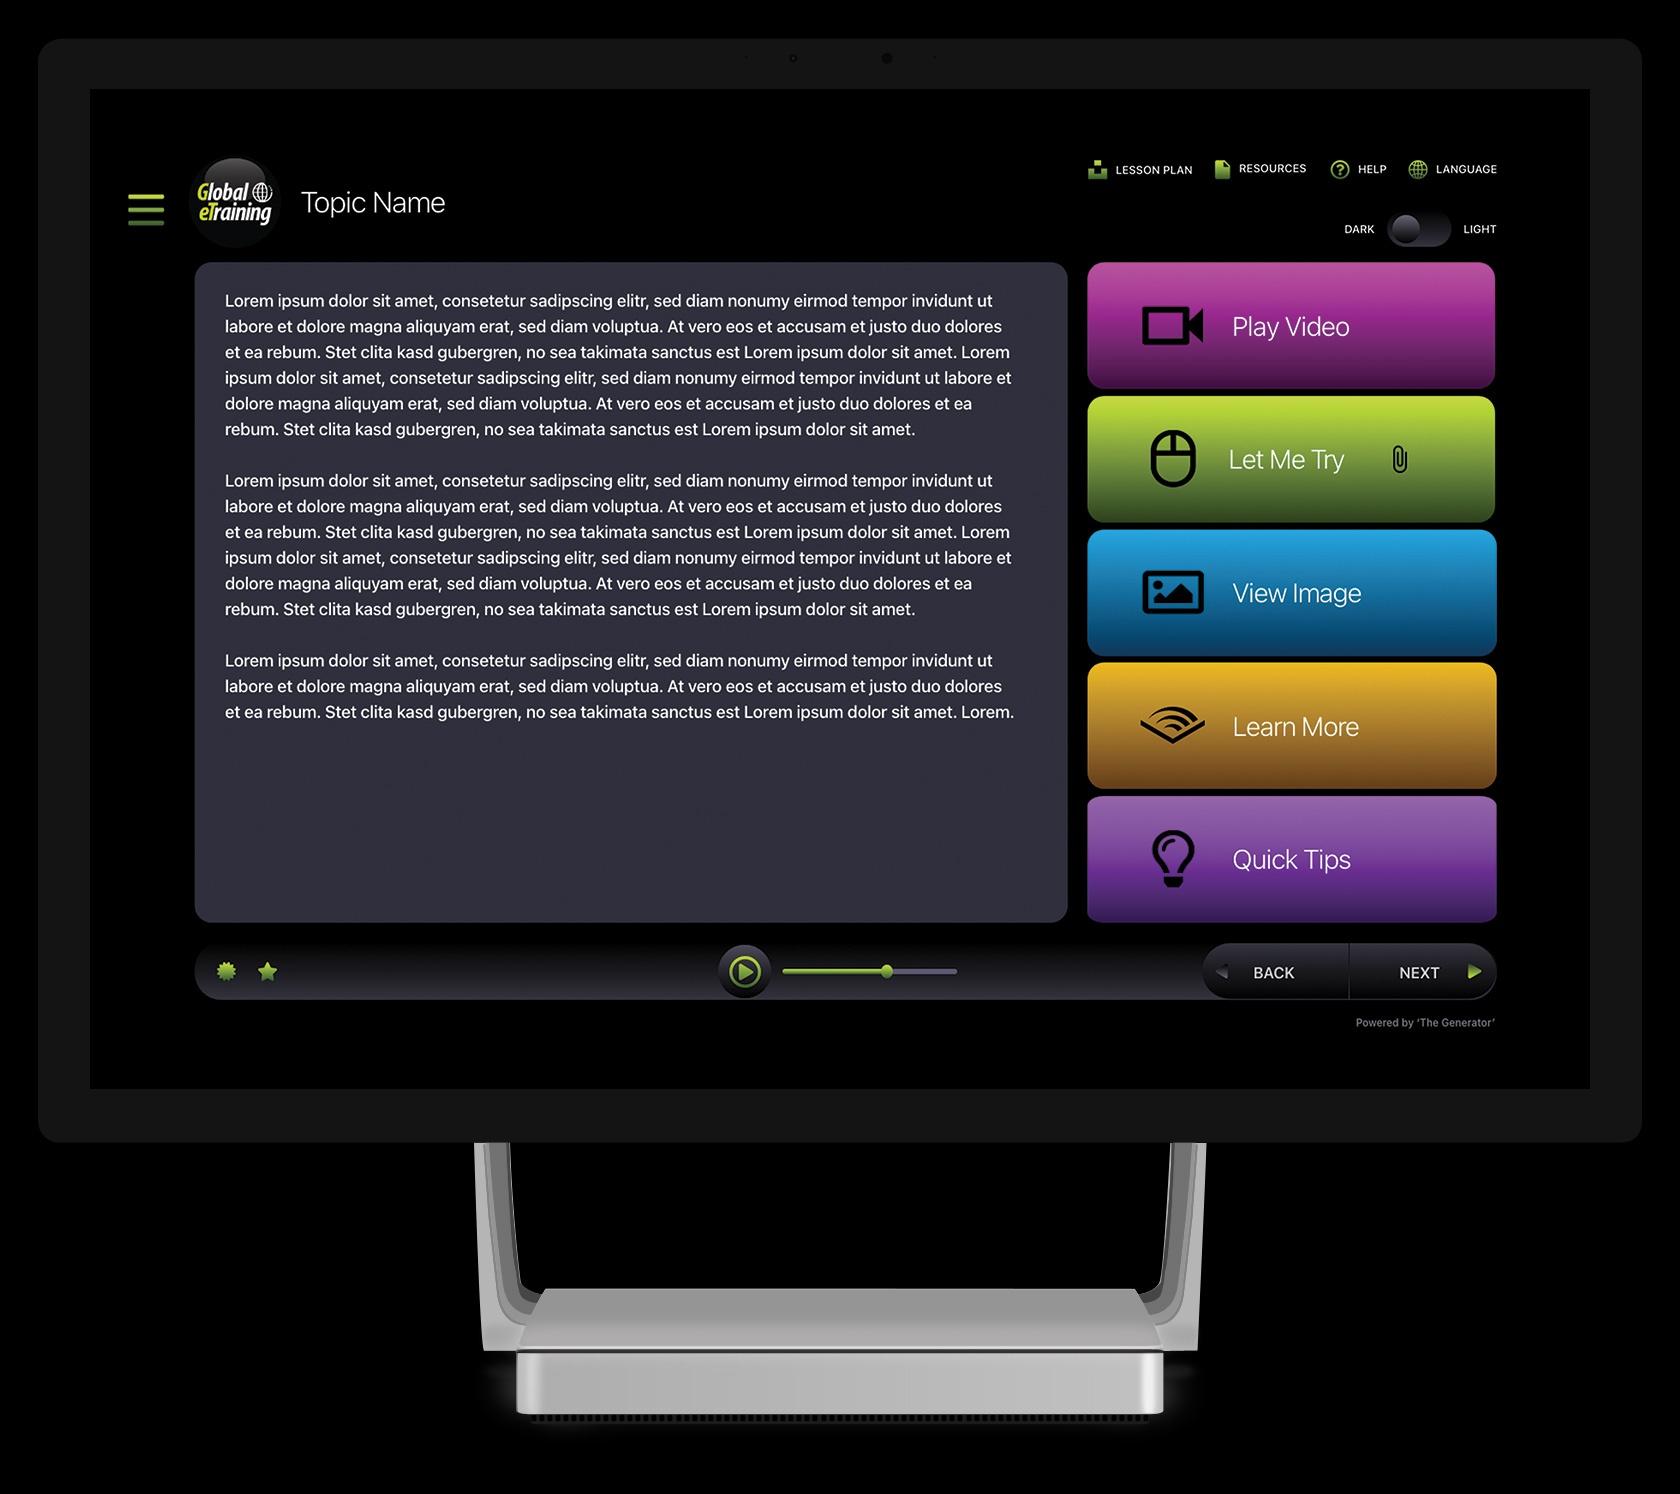 Course Interface on Desktop